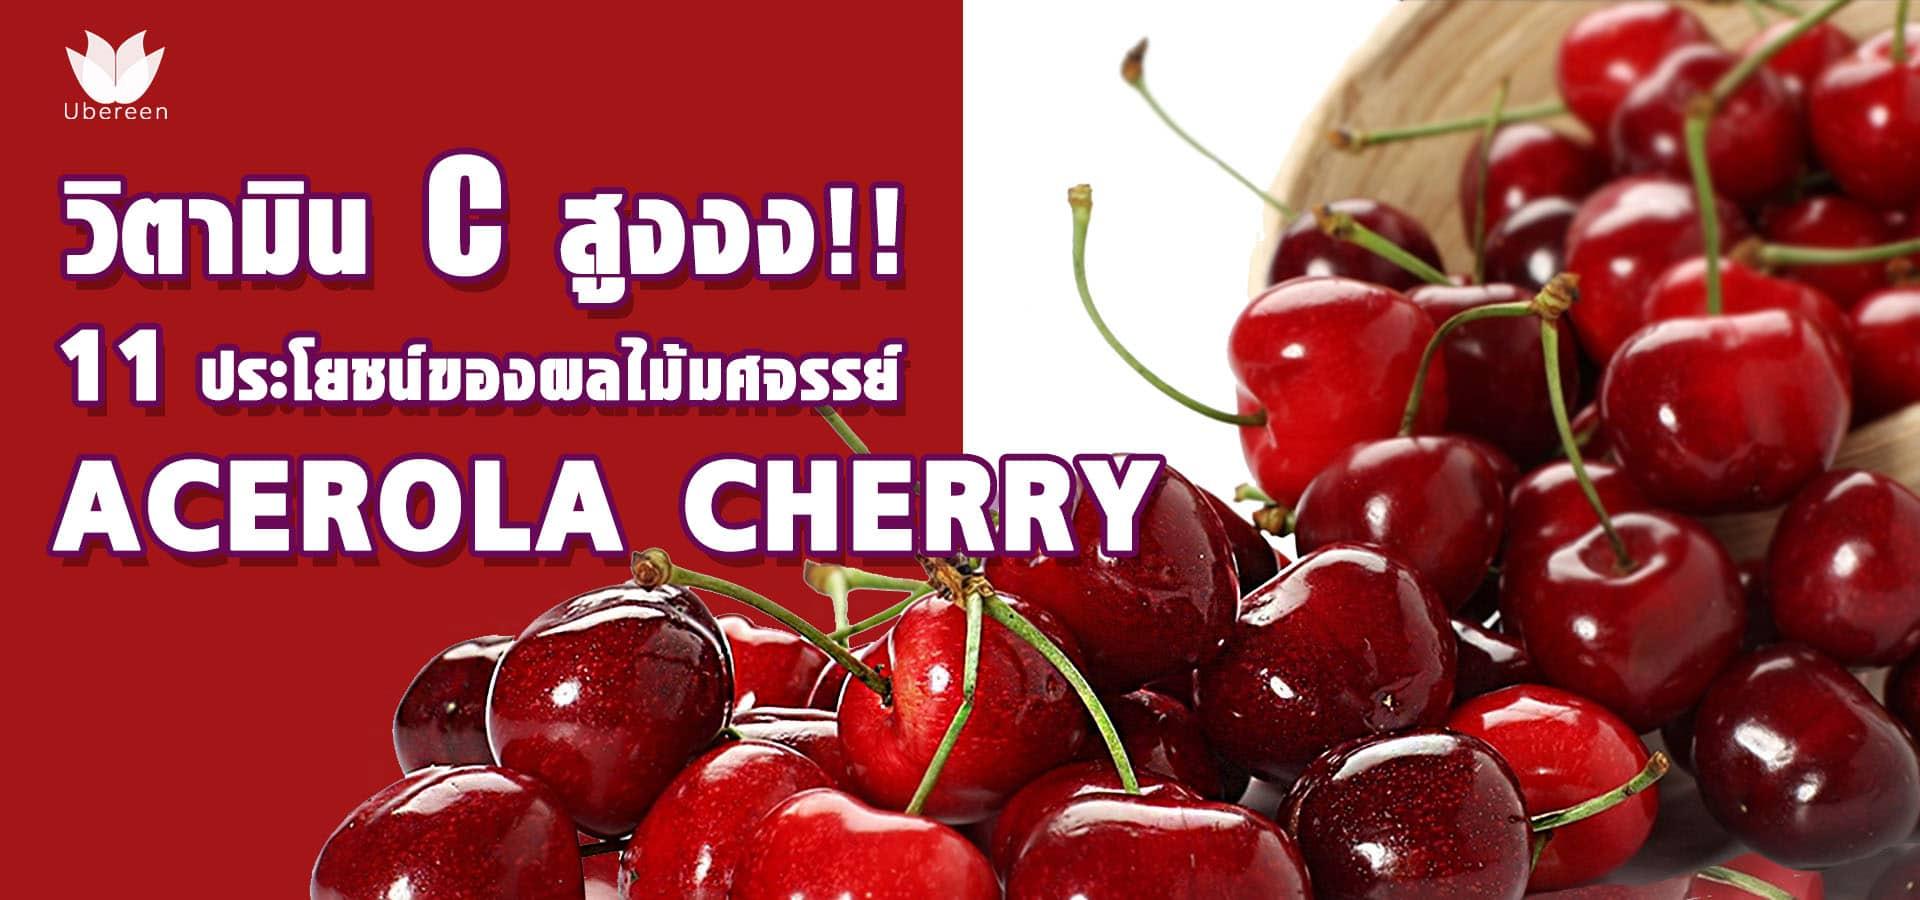 acerola cherry อเซโรล่าเชอร์รี่ header